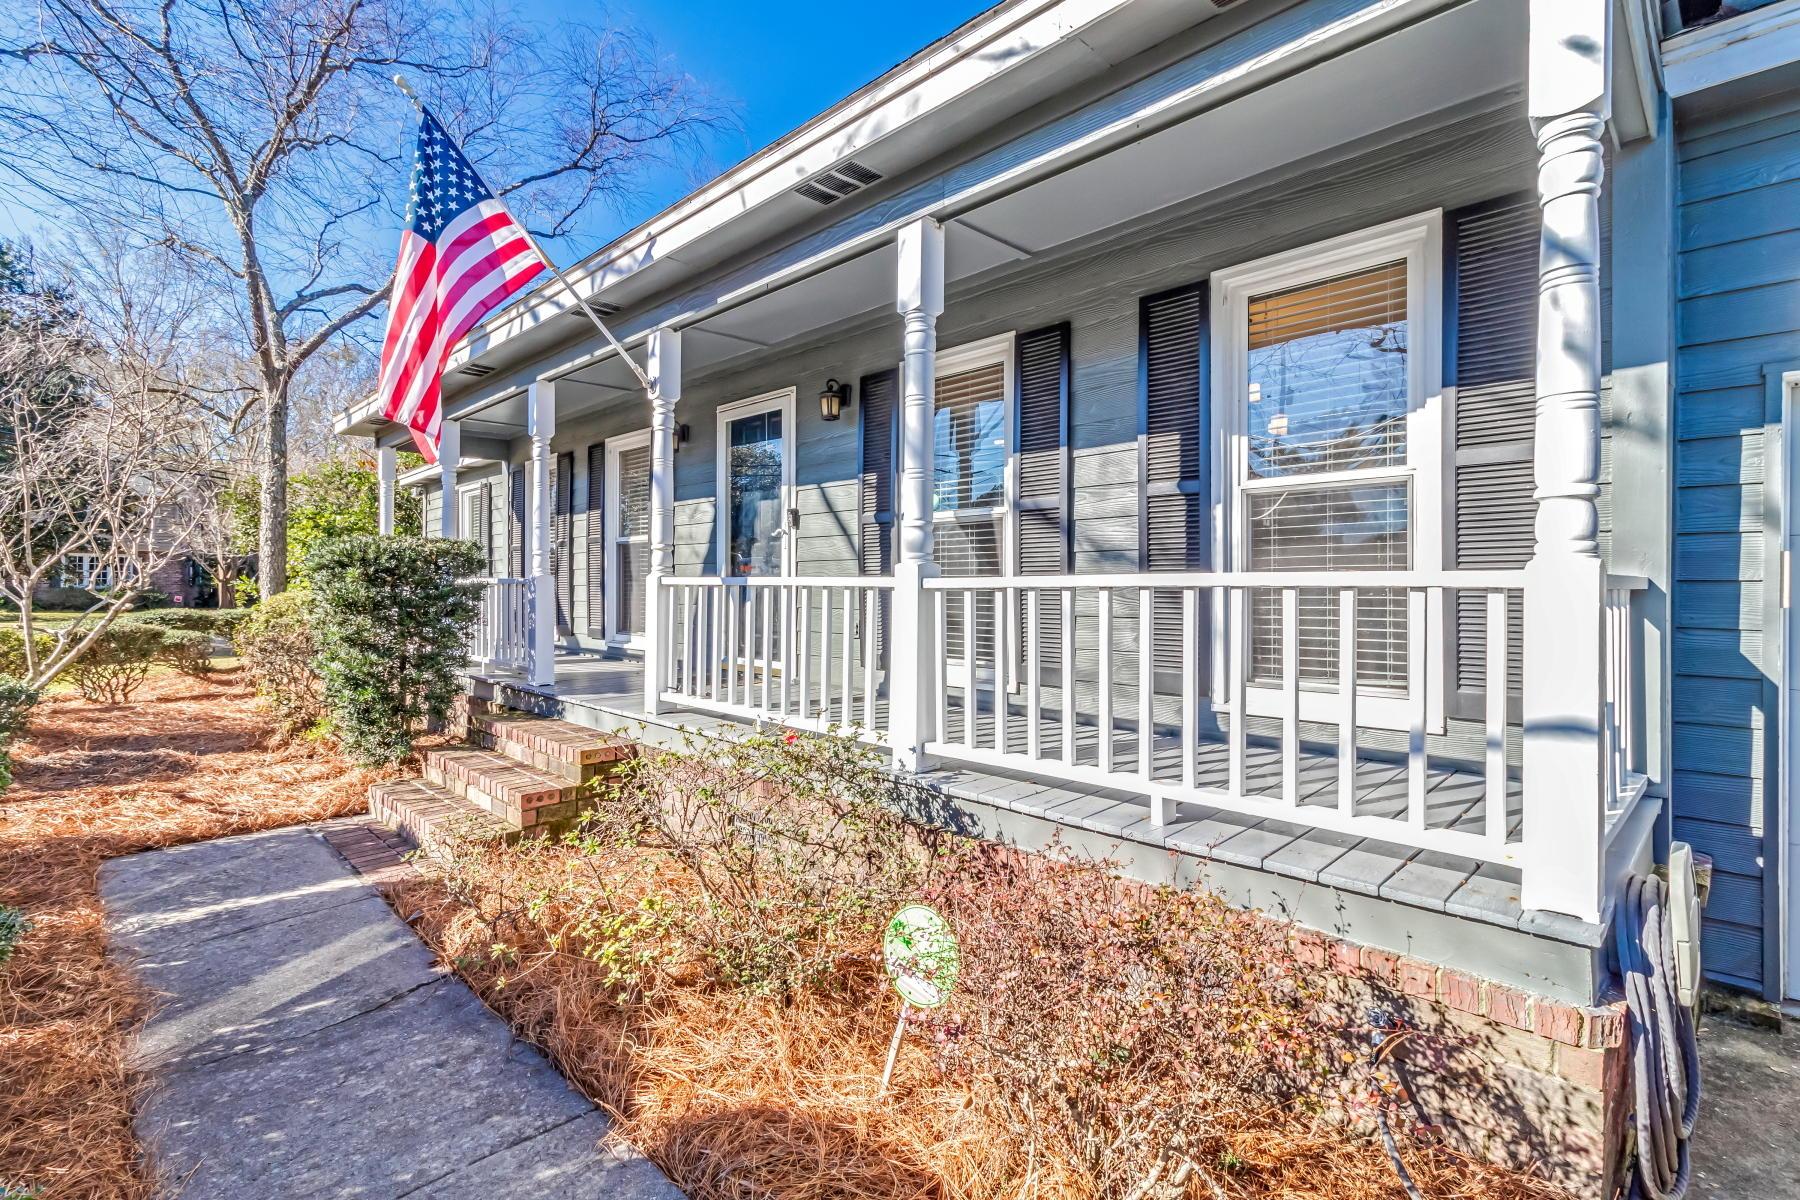 Harrison Acres Homes For Sale - 51 Markfield, Charleston, SC - 11